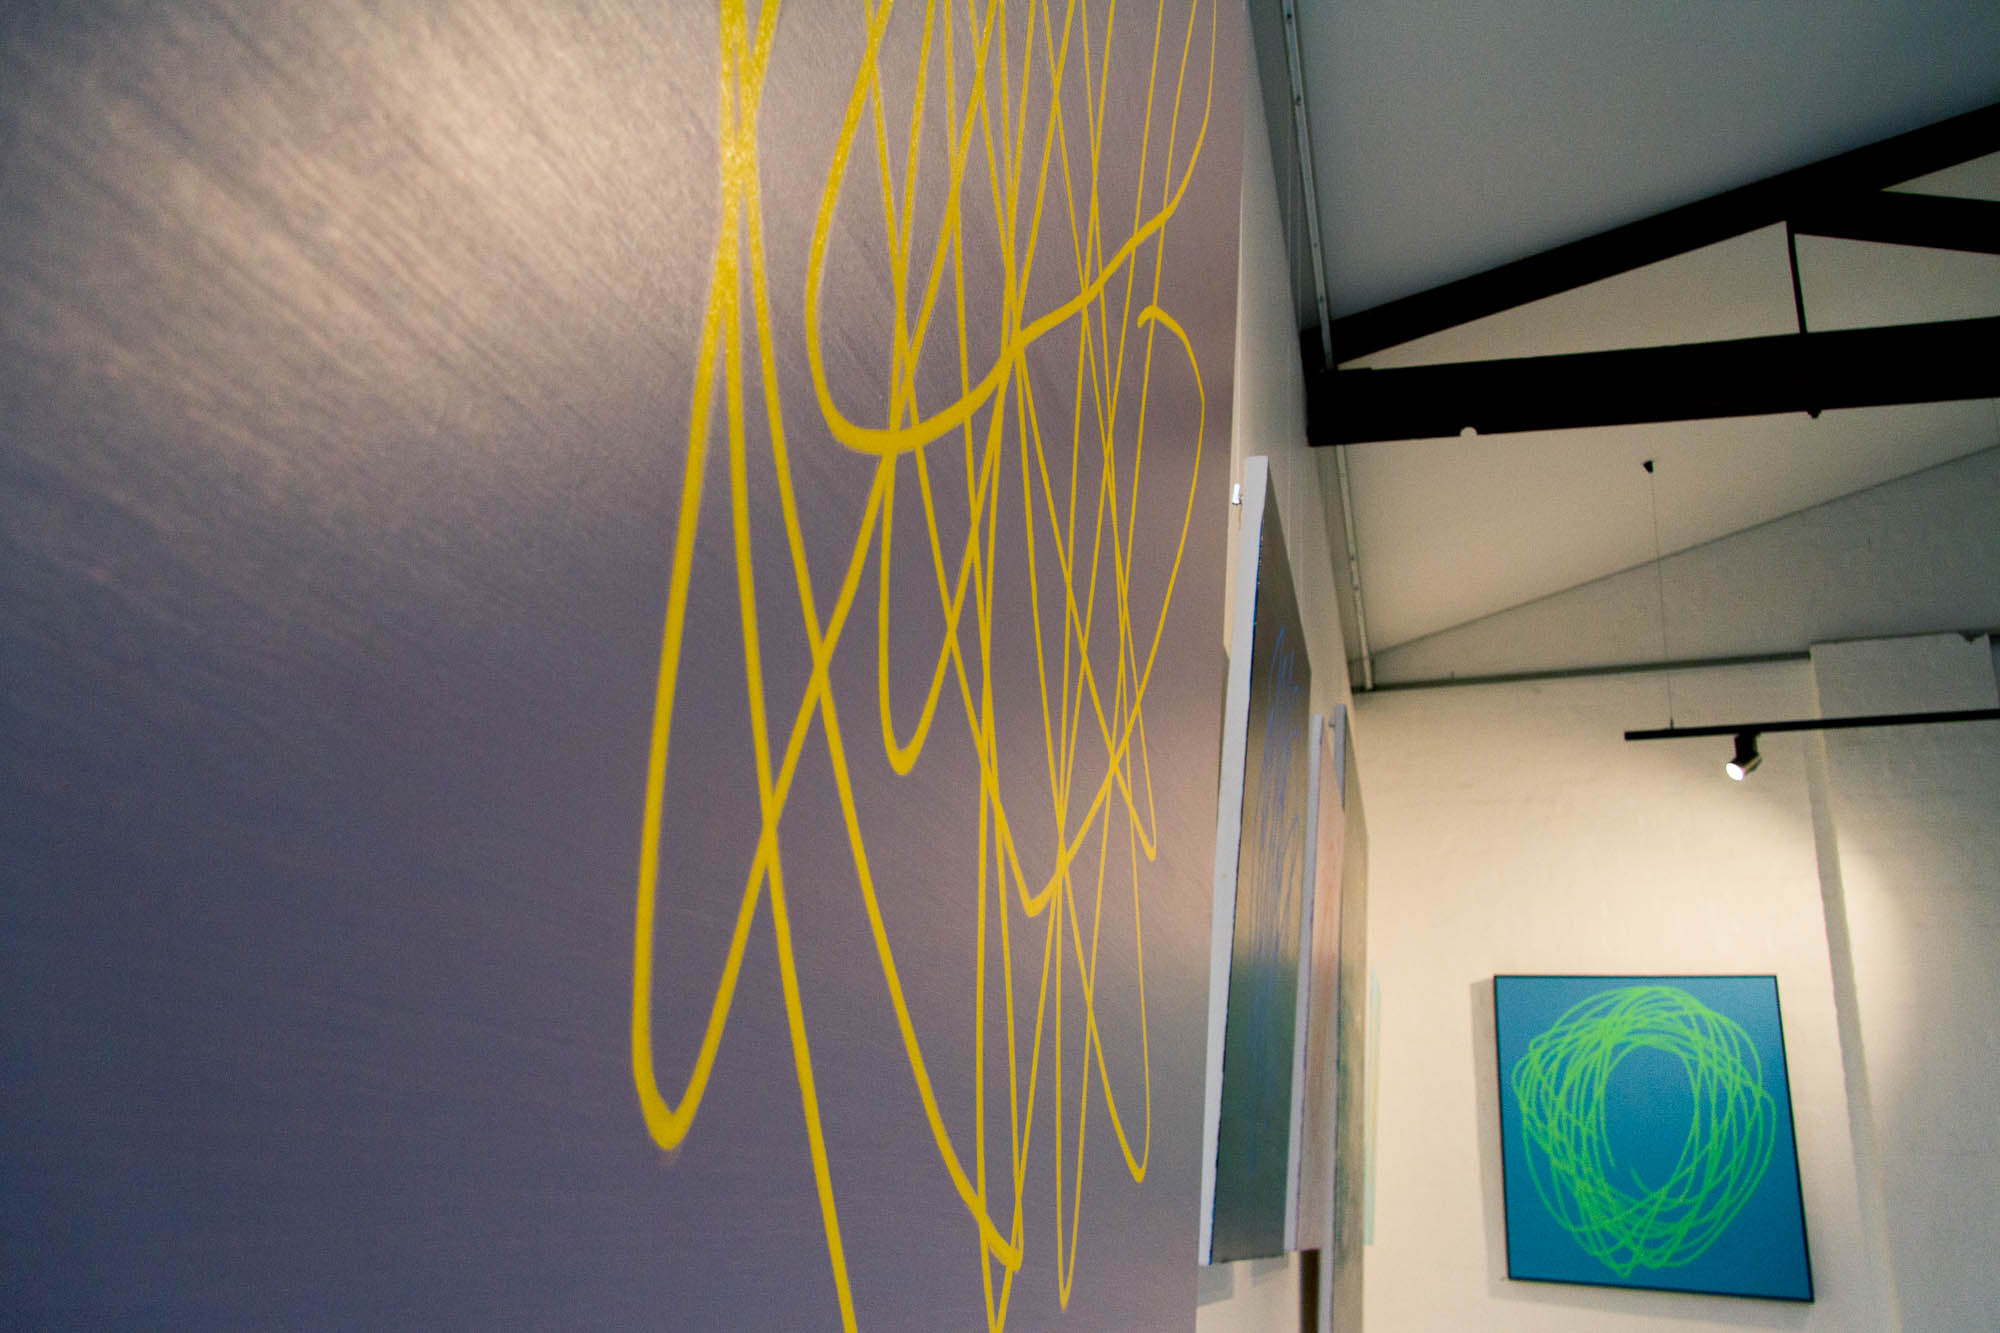 Art Pharamacy_Vandal Gallery_Pressure Sensitive_ Joel Dickens_7D_Vandal Pressure Sensitive 012.JPG